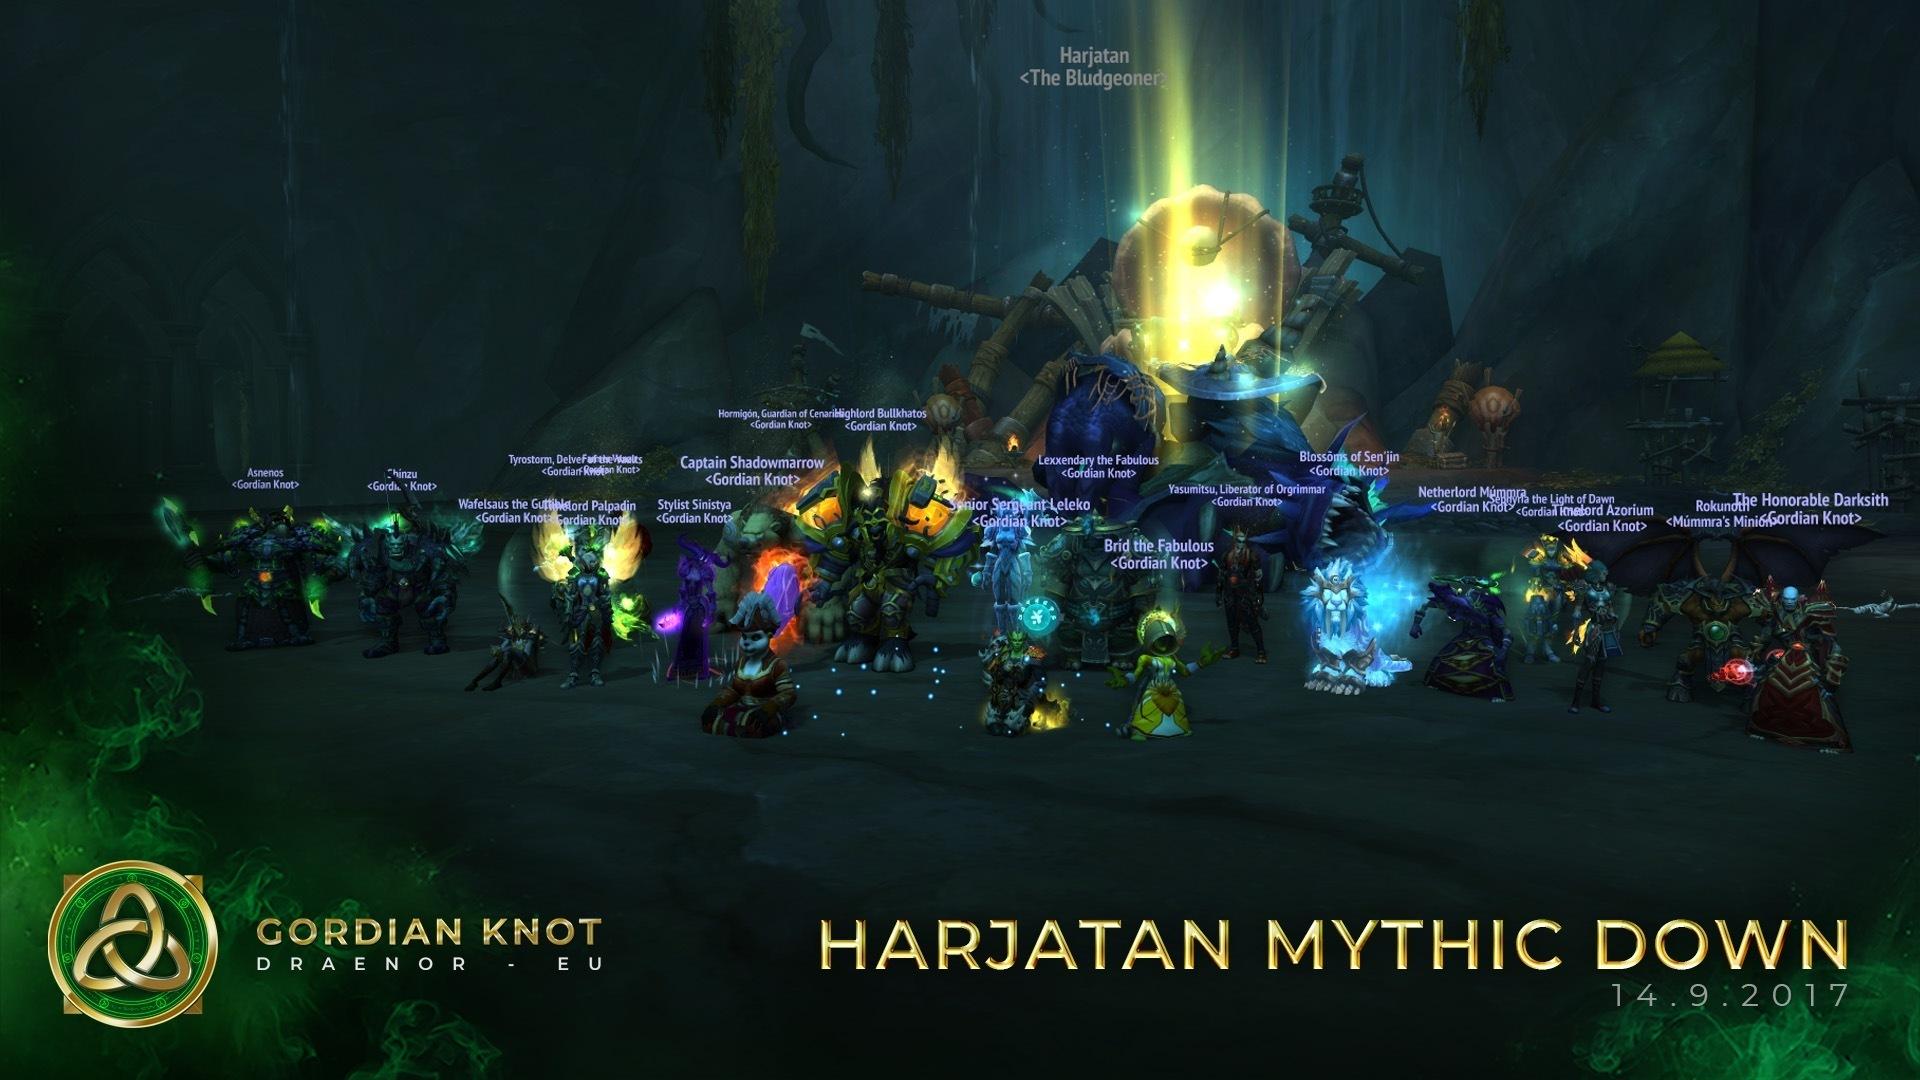 Harjatan Mythic